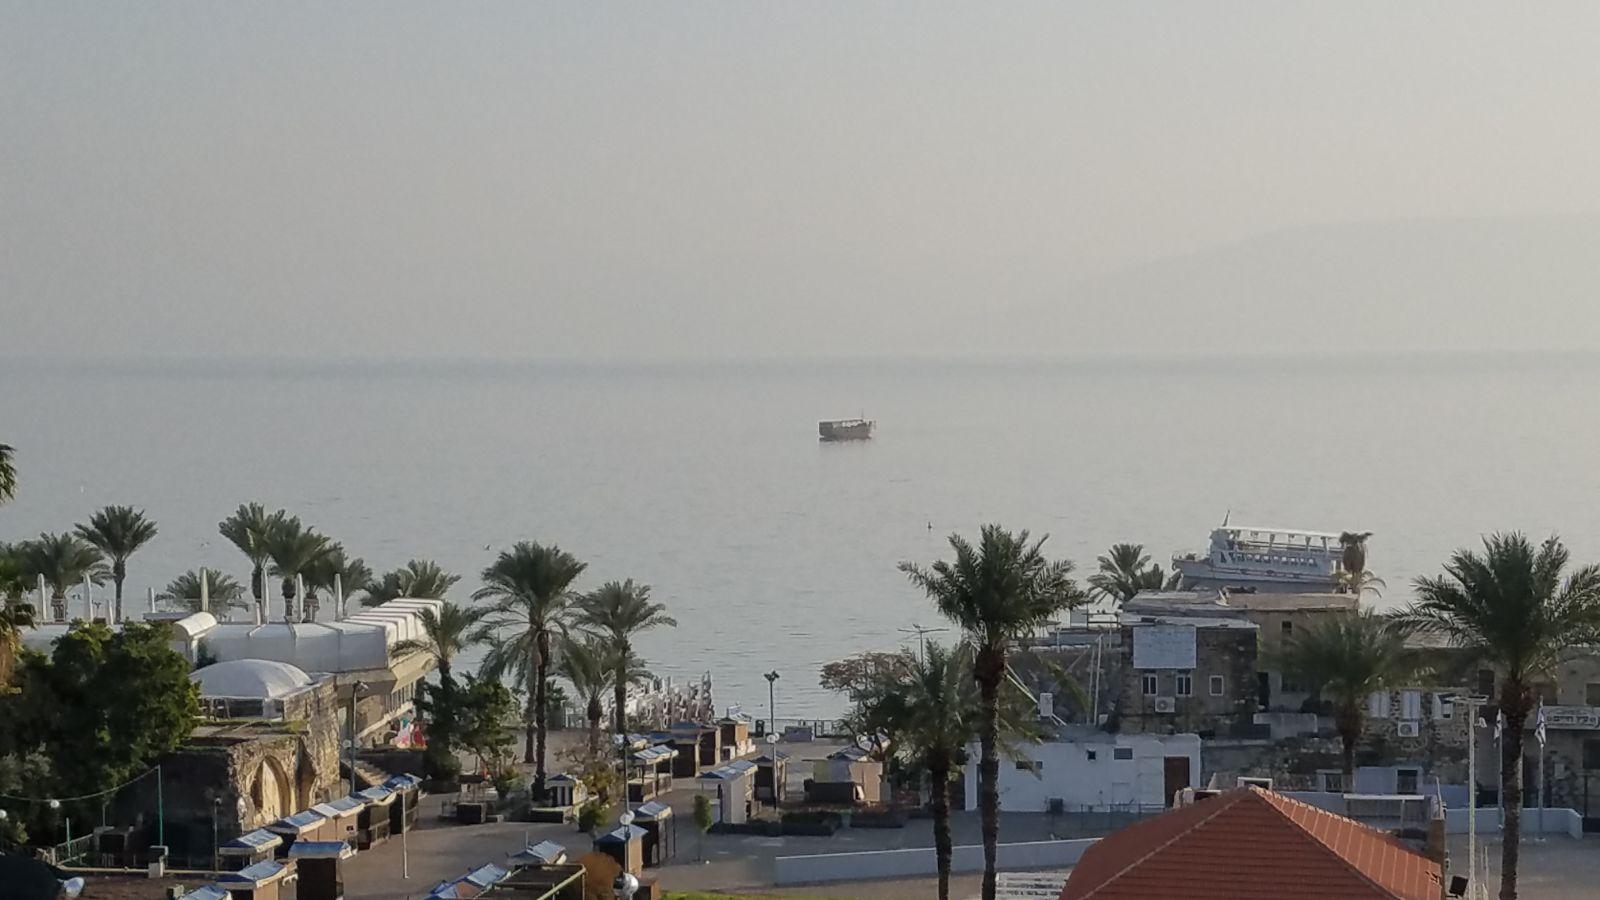 Sea of Galilee-20190123-01